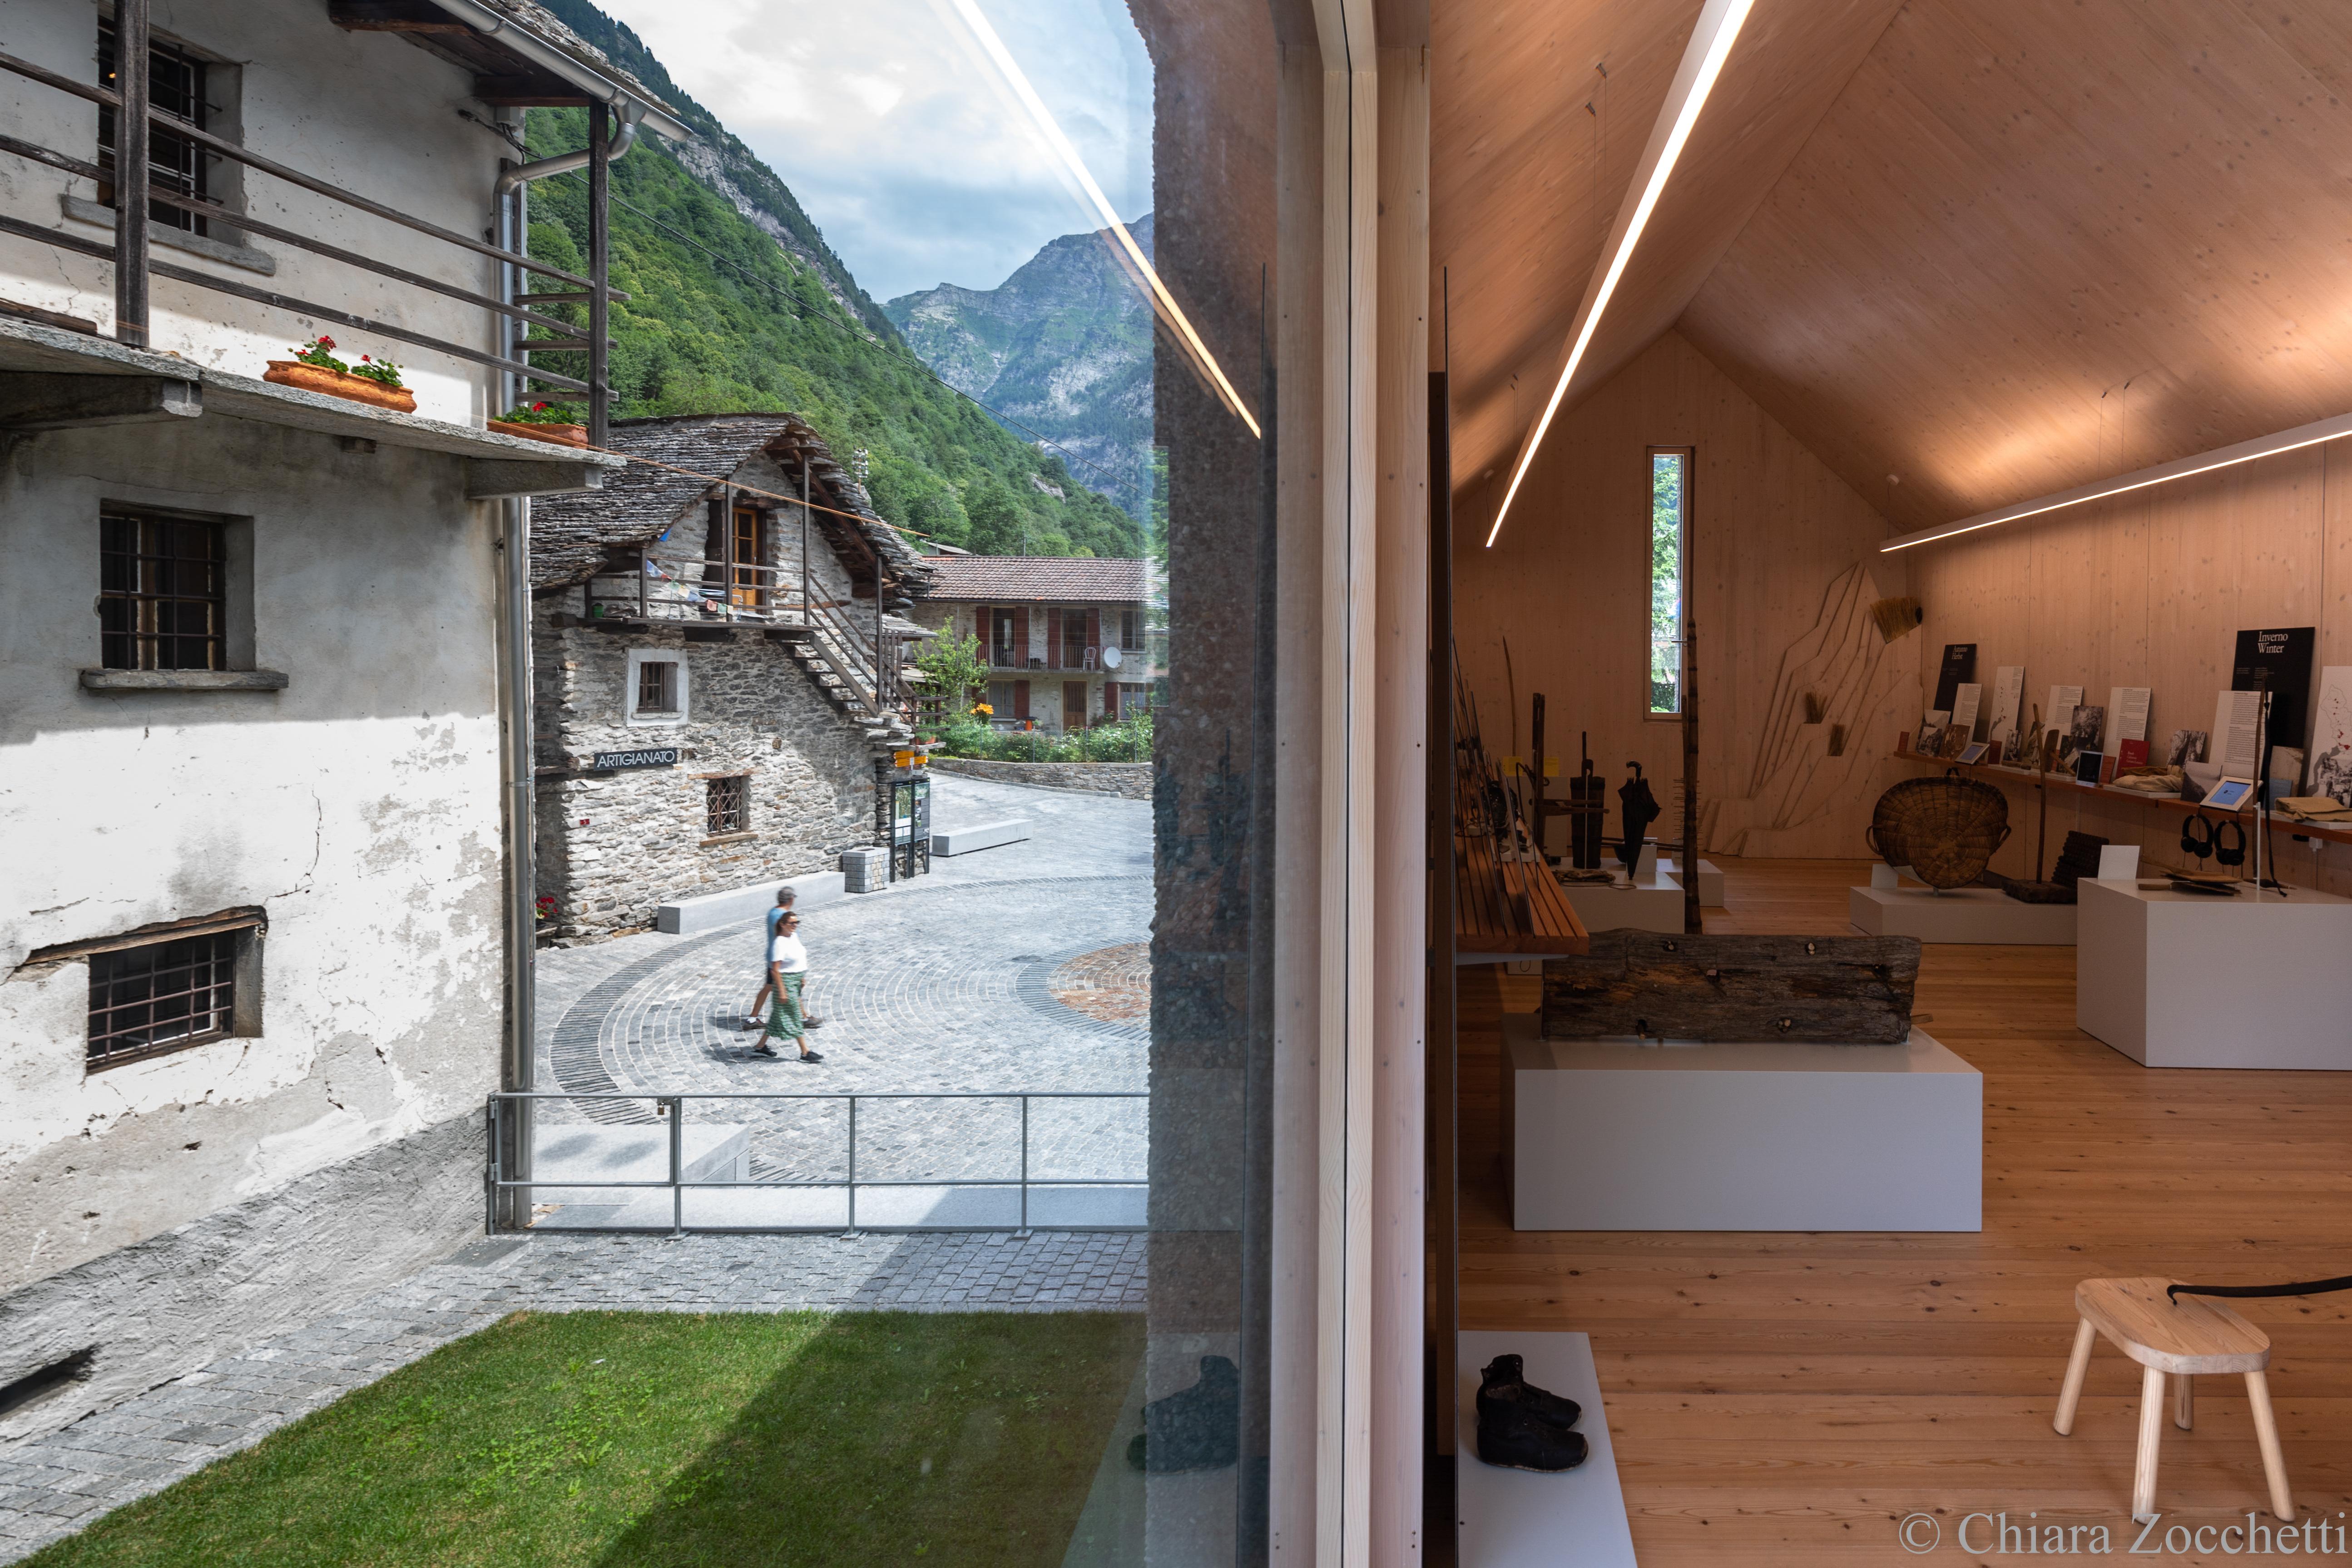 Museo della Valle Verzasca